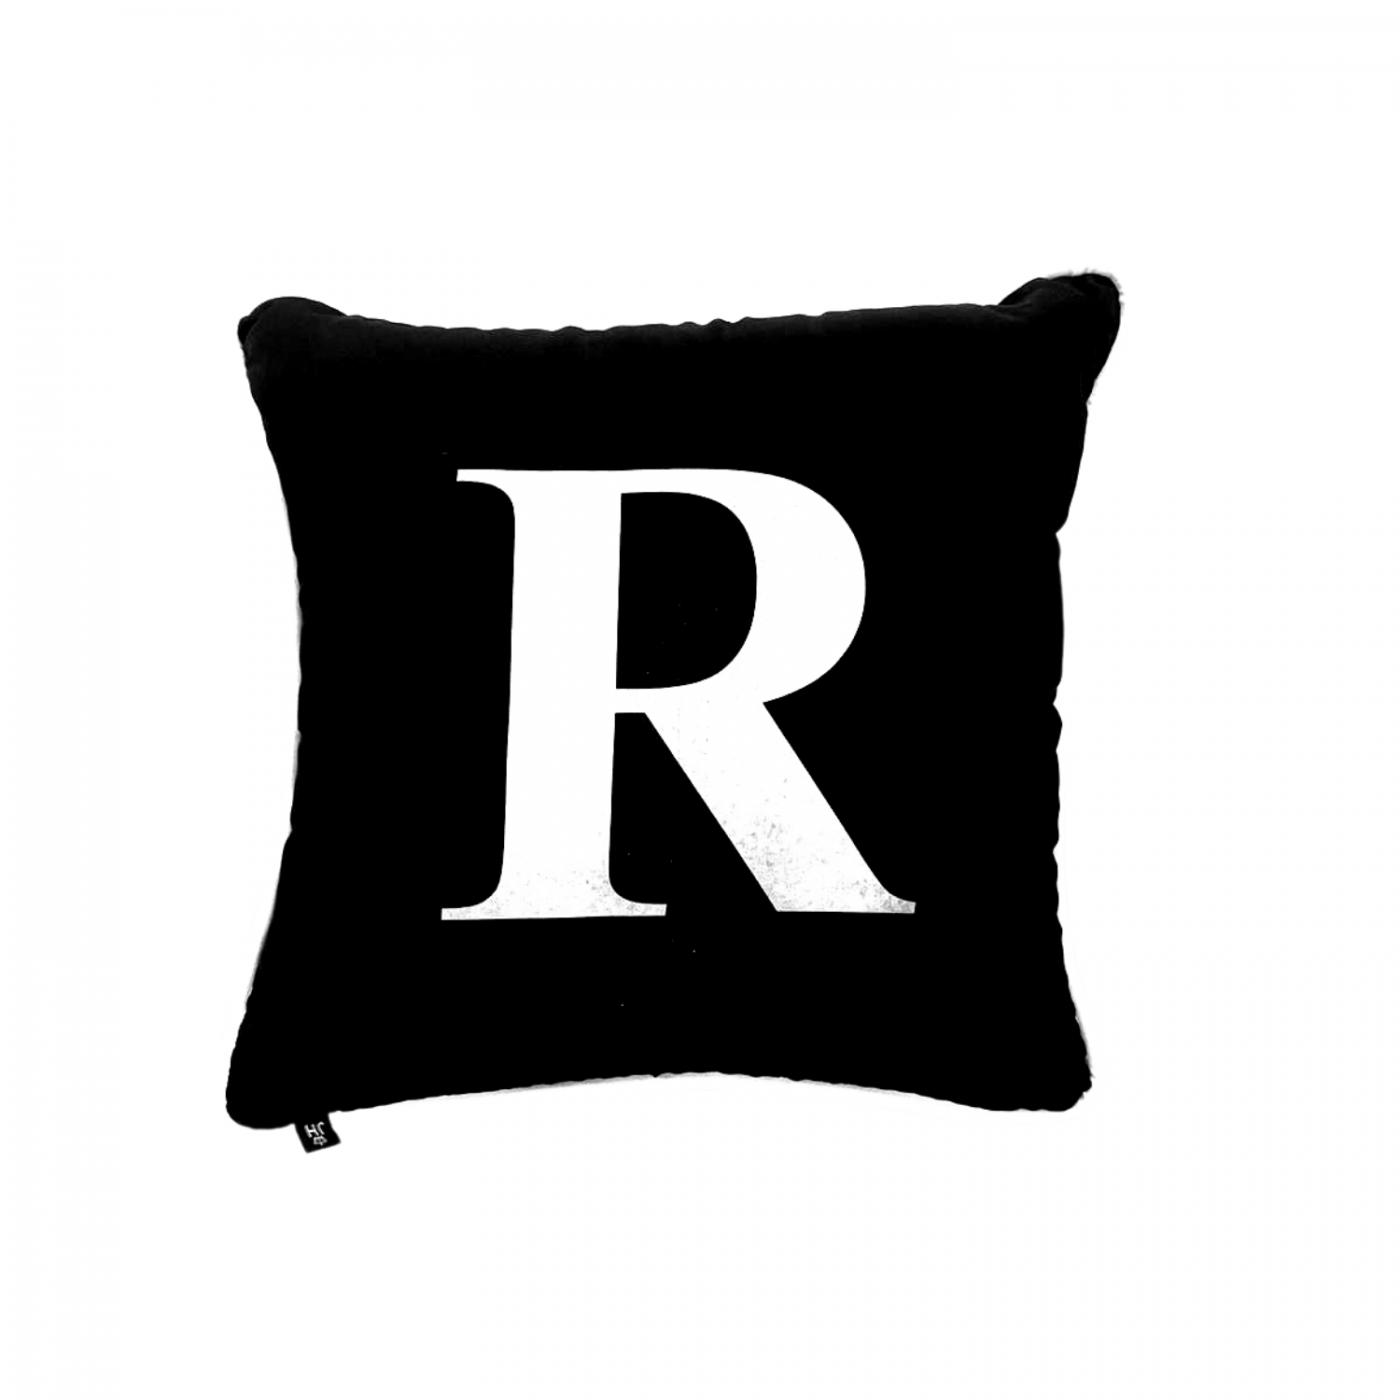 Almofada Inicial personalizada letra em branco